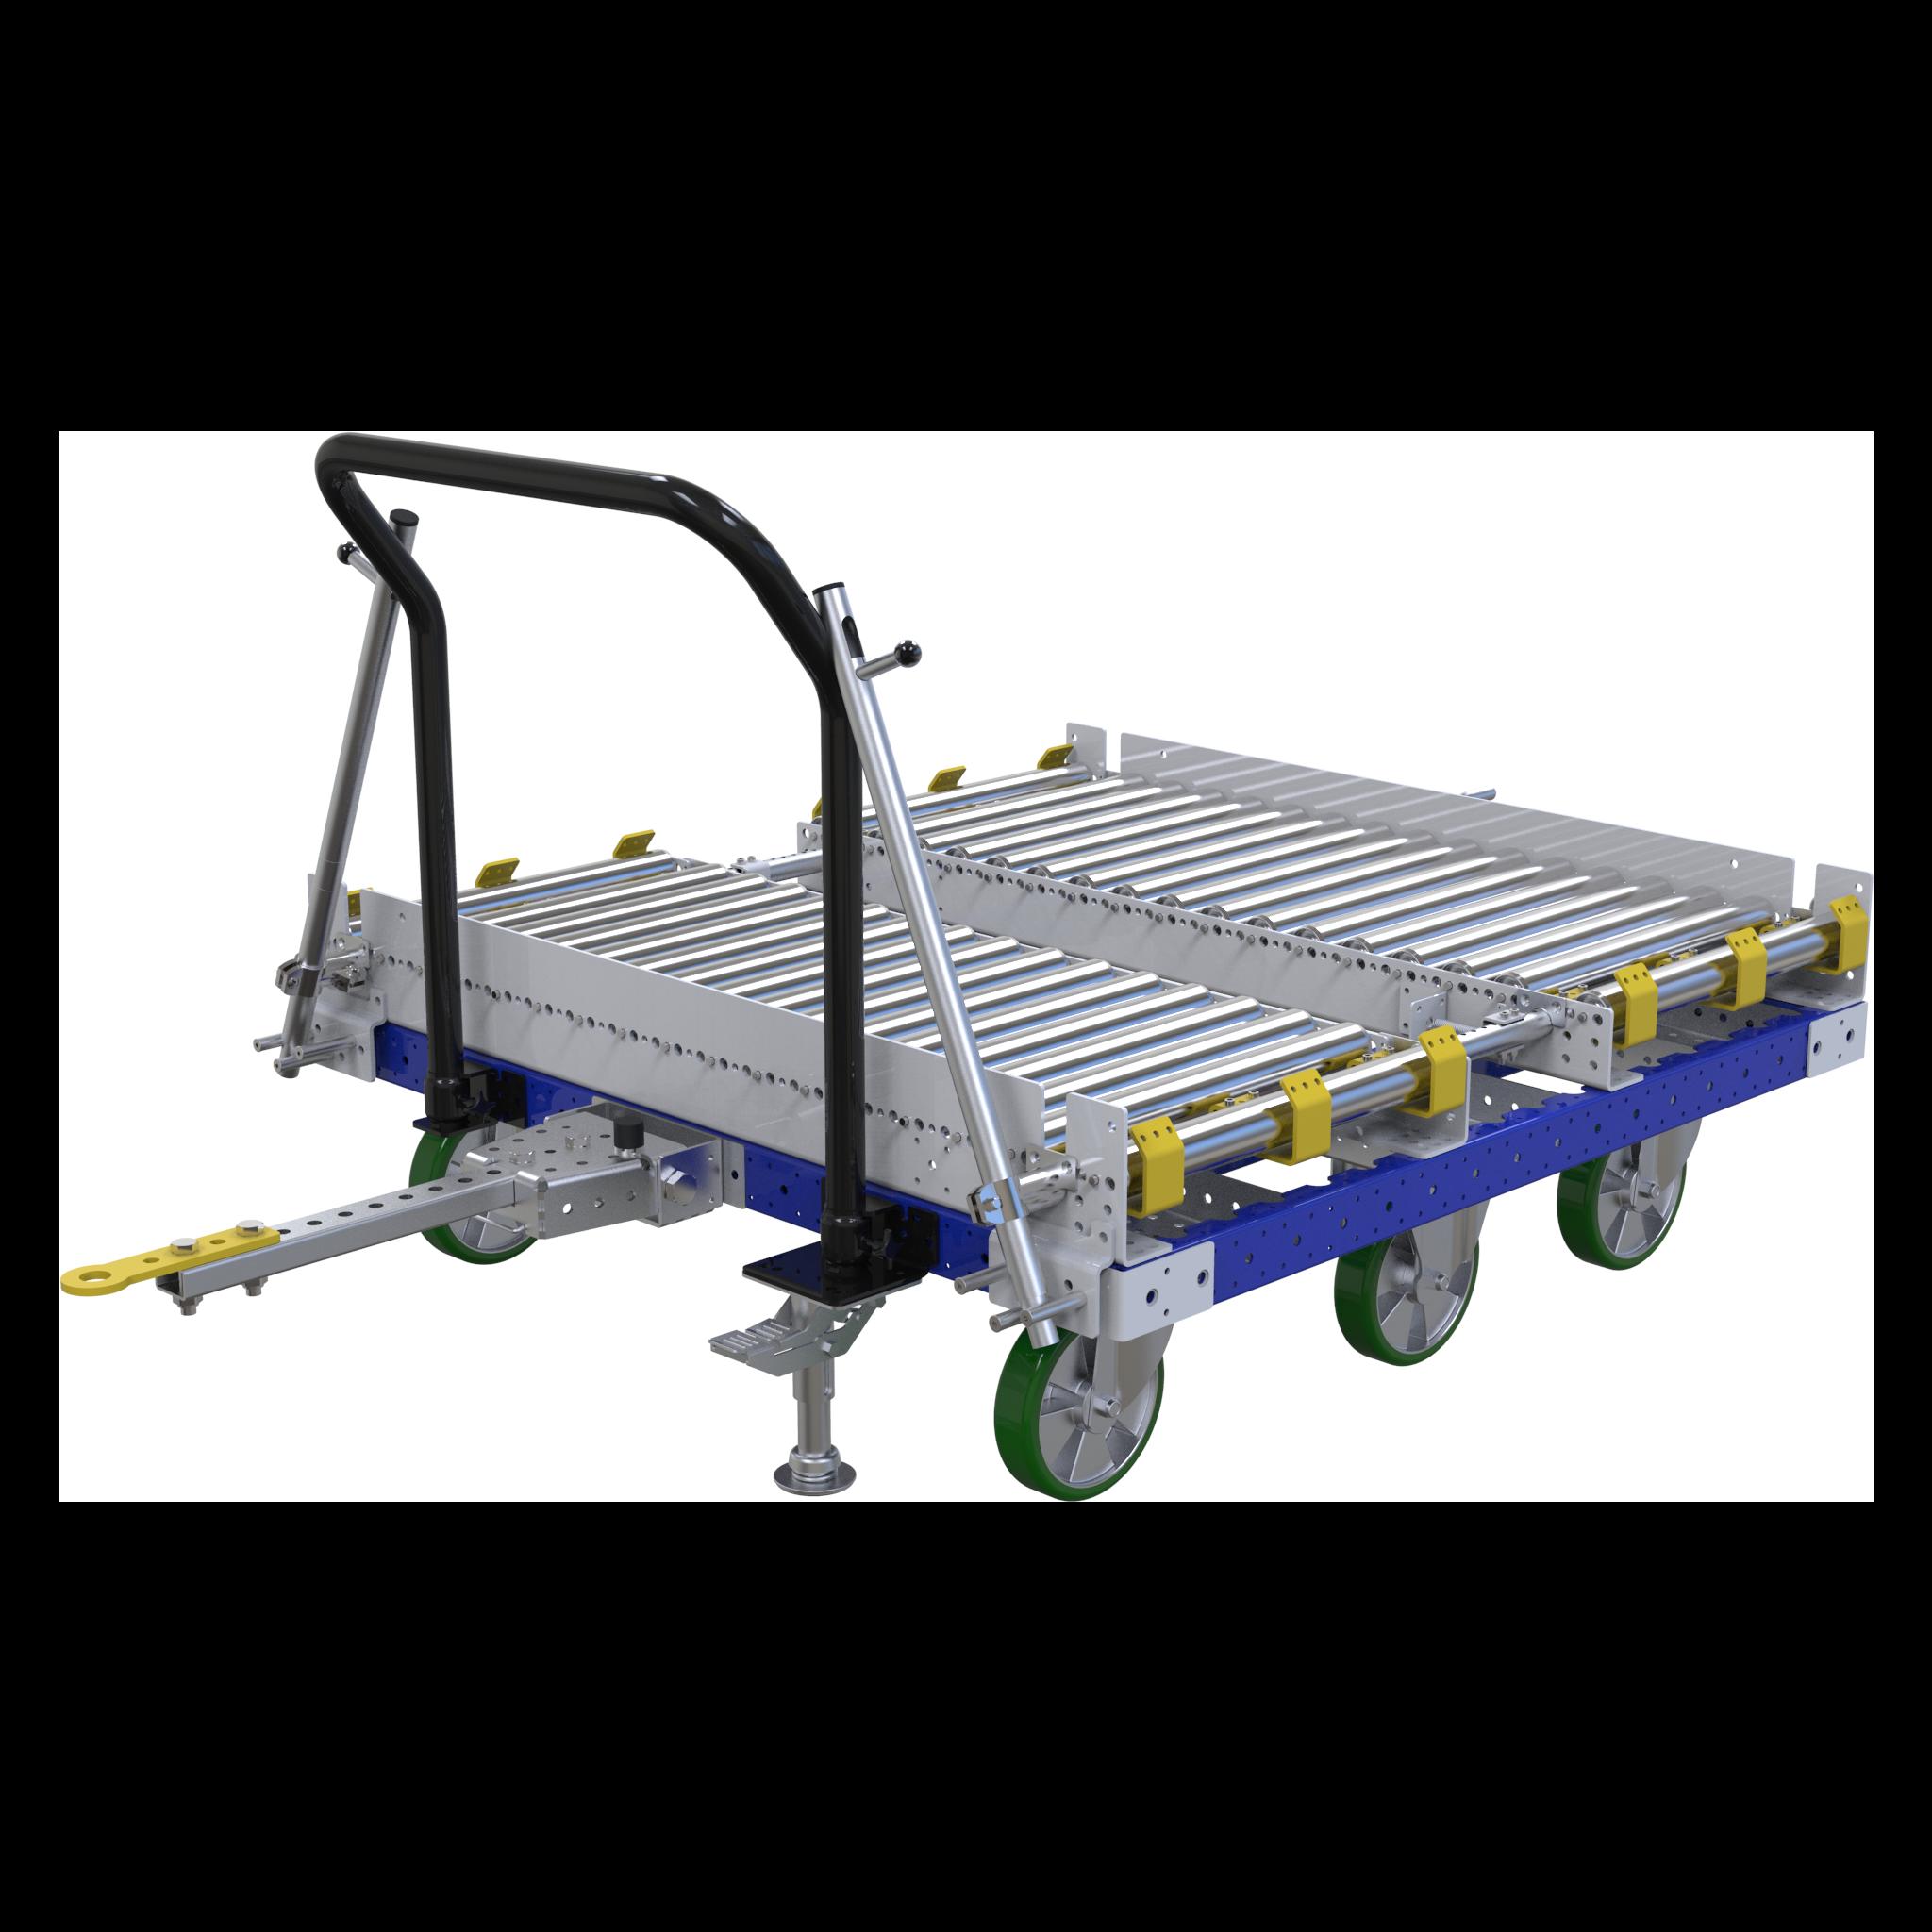 Conveyor Push / Tugger Cart - 1260 x 1260 mm